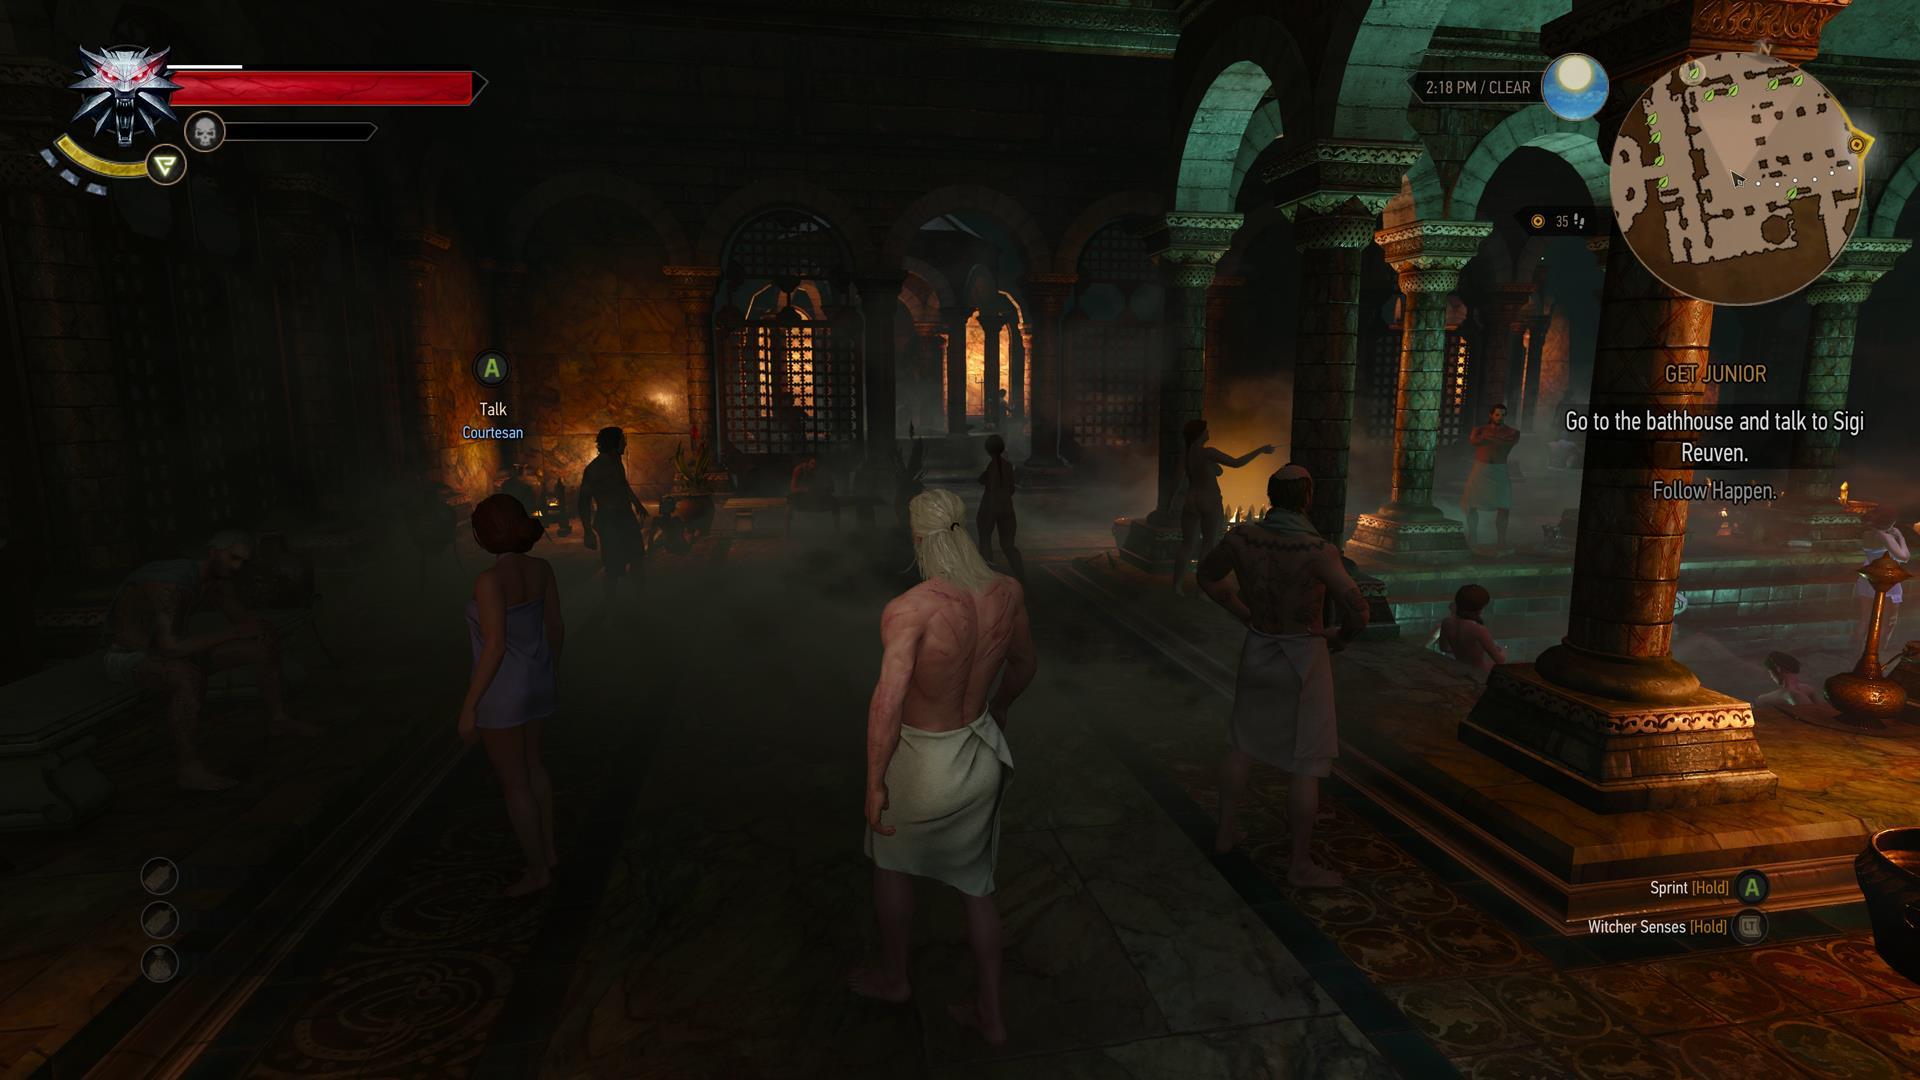 The Witcher 3: Wild Hunt. Новые скриншоты.    UPD#1  UPD#2  - Изображение 9